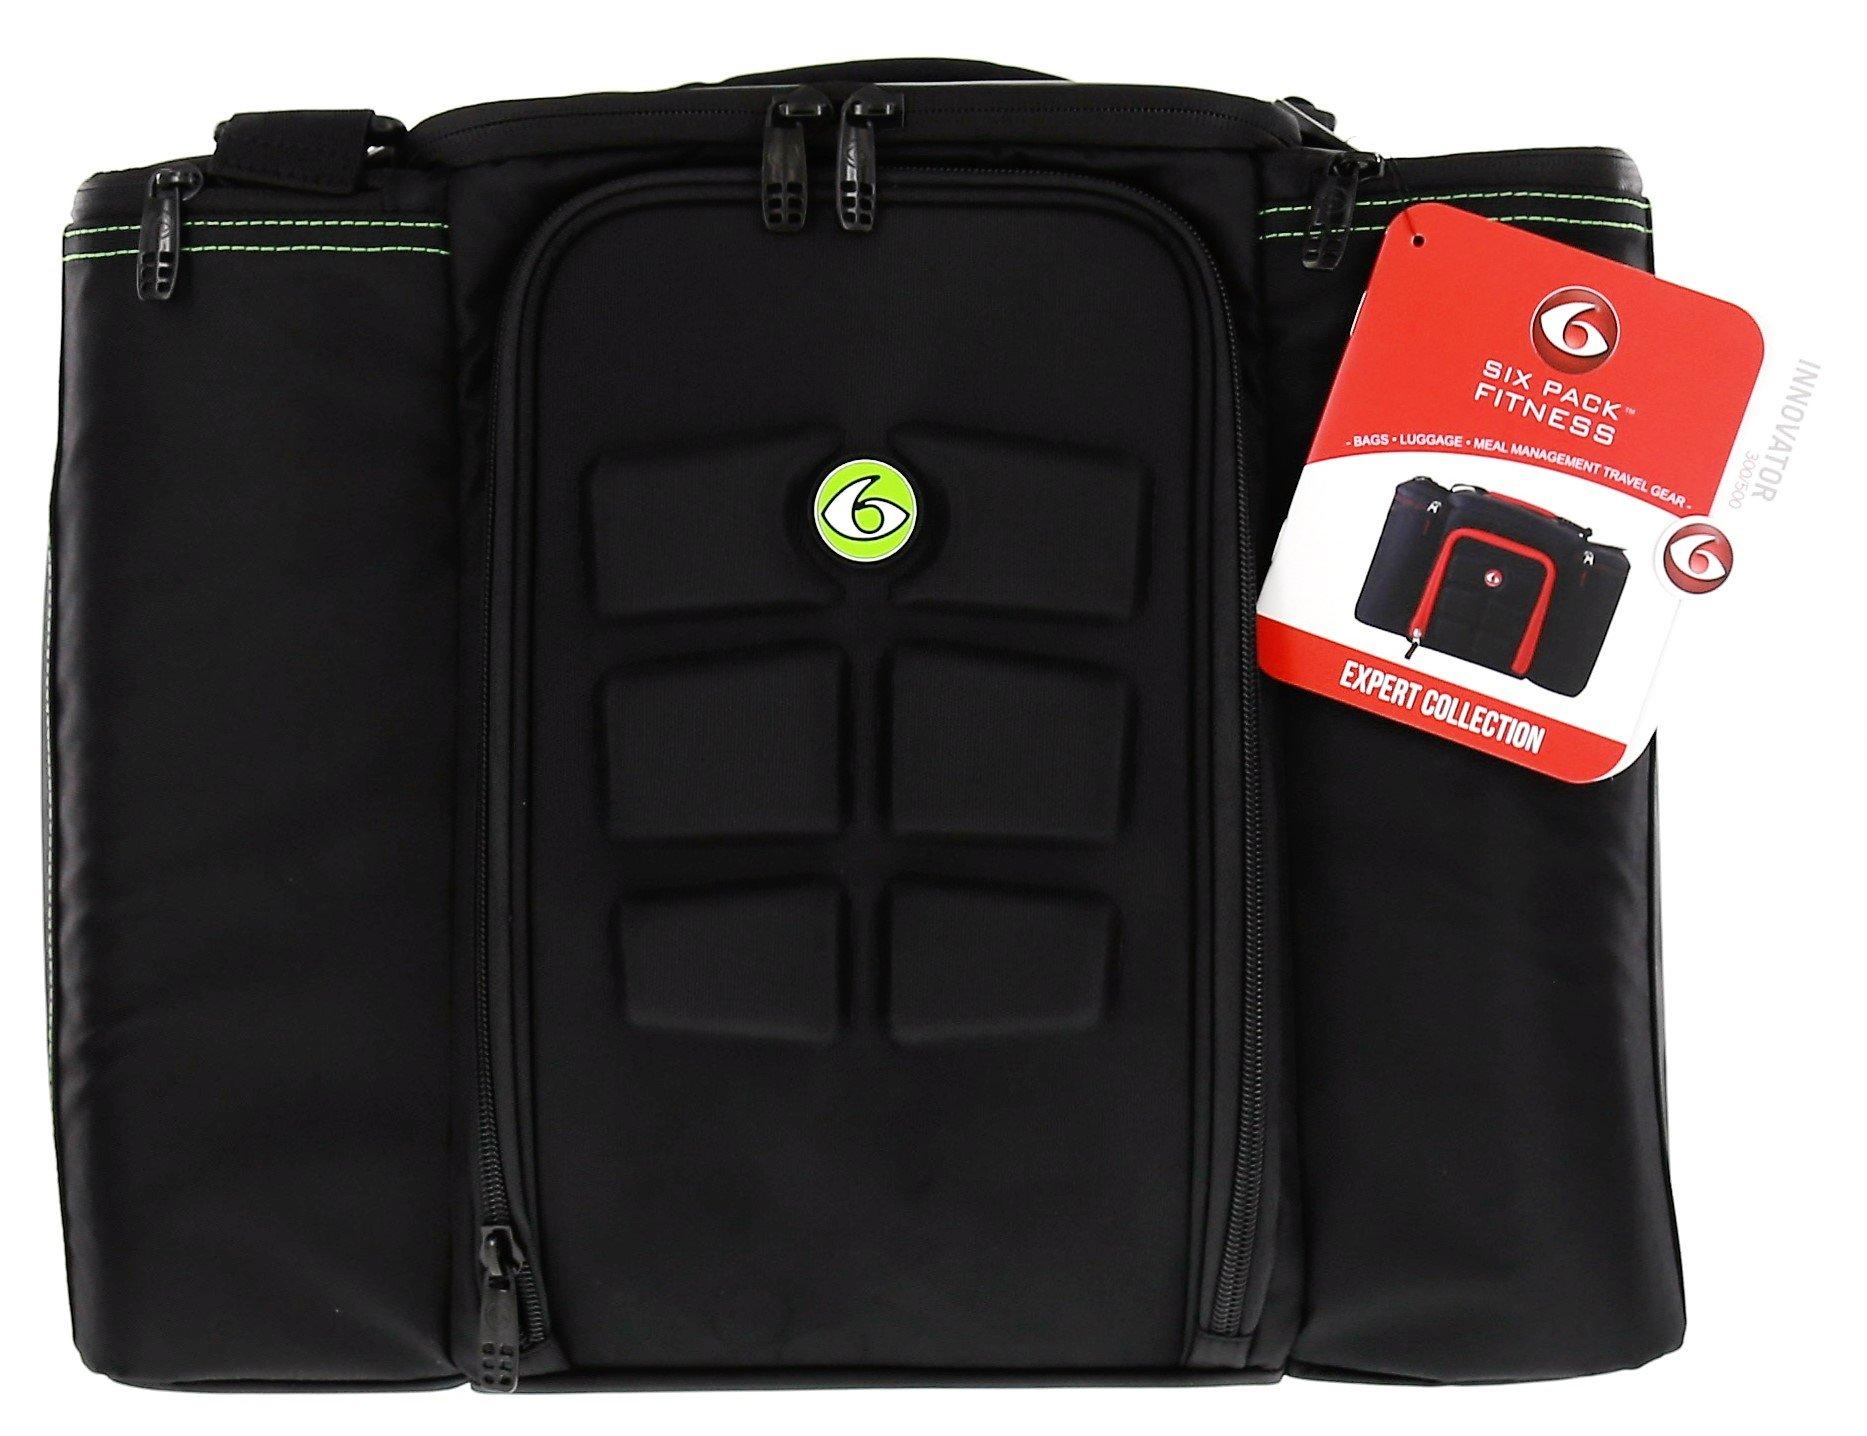 6 Pack Fitness Bag Innovator 500 Black/Neon Green (5 Meal)